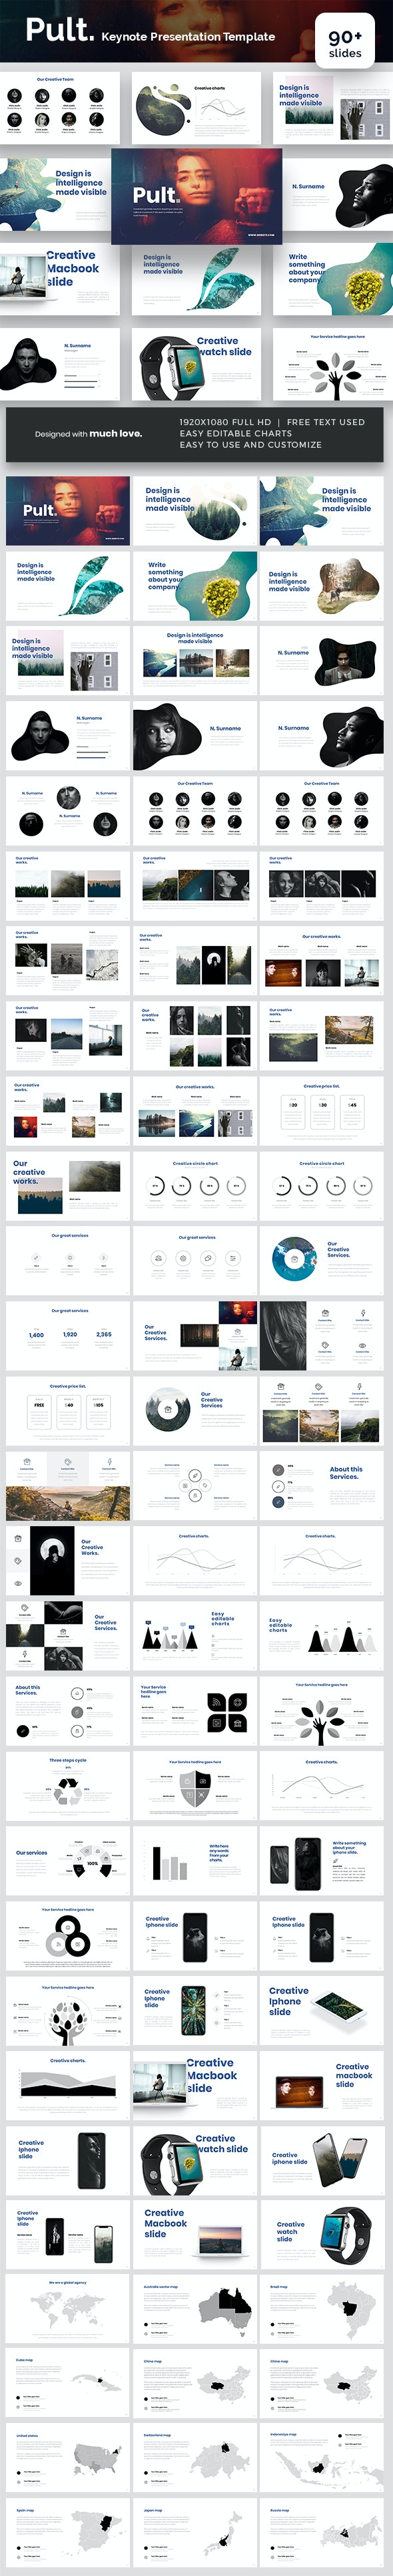 Pult Keynote Presentation Template - Keynote Templates Presentation Templates